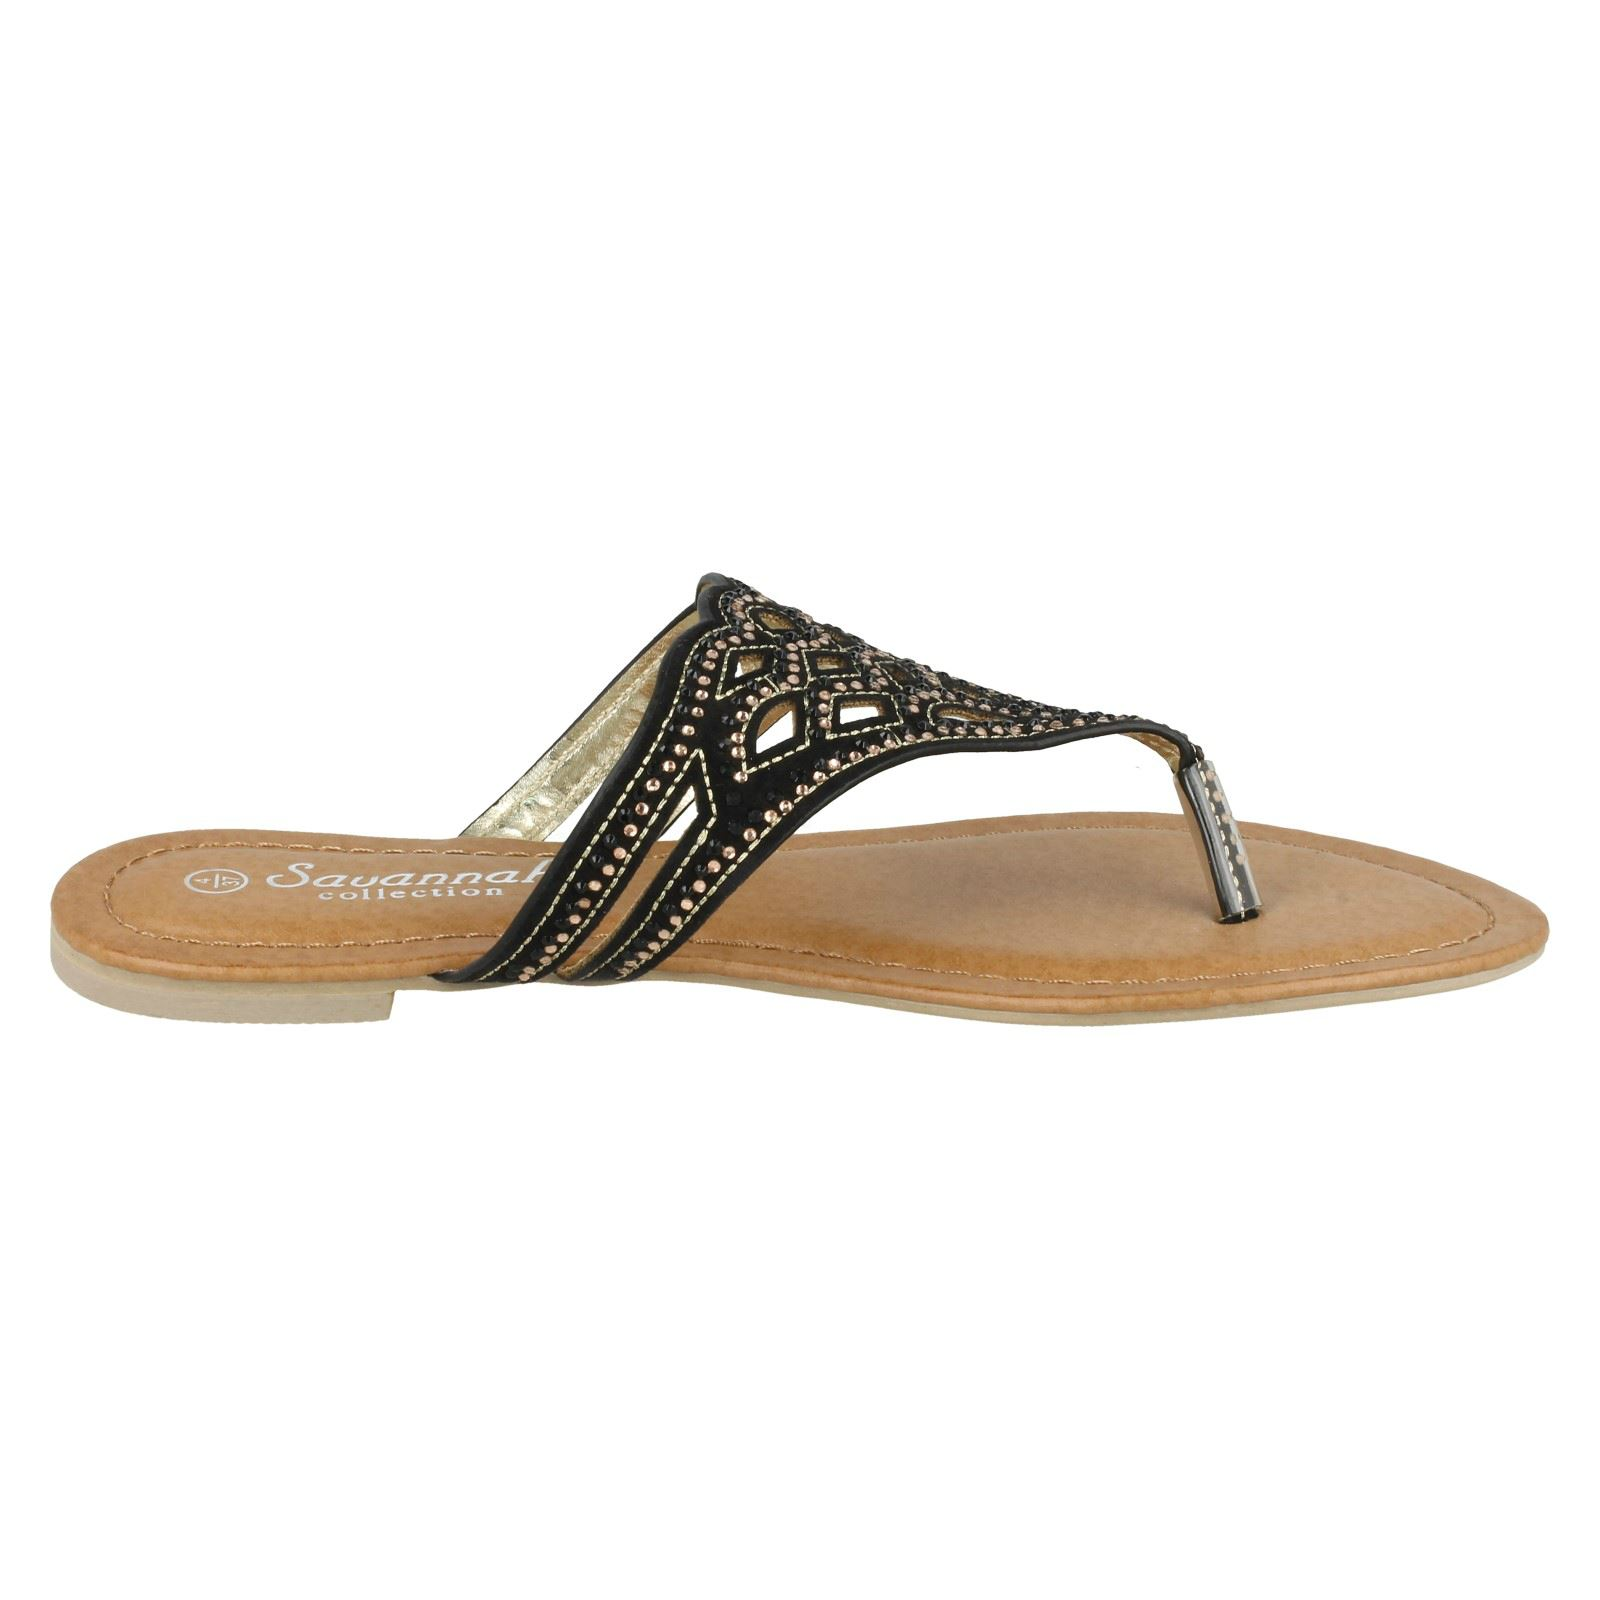 ad1b151467e6 Ladies-Savannah-Toe-Post-Sandals thumbnail 6